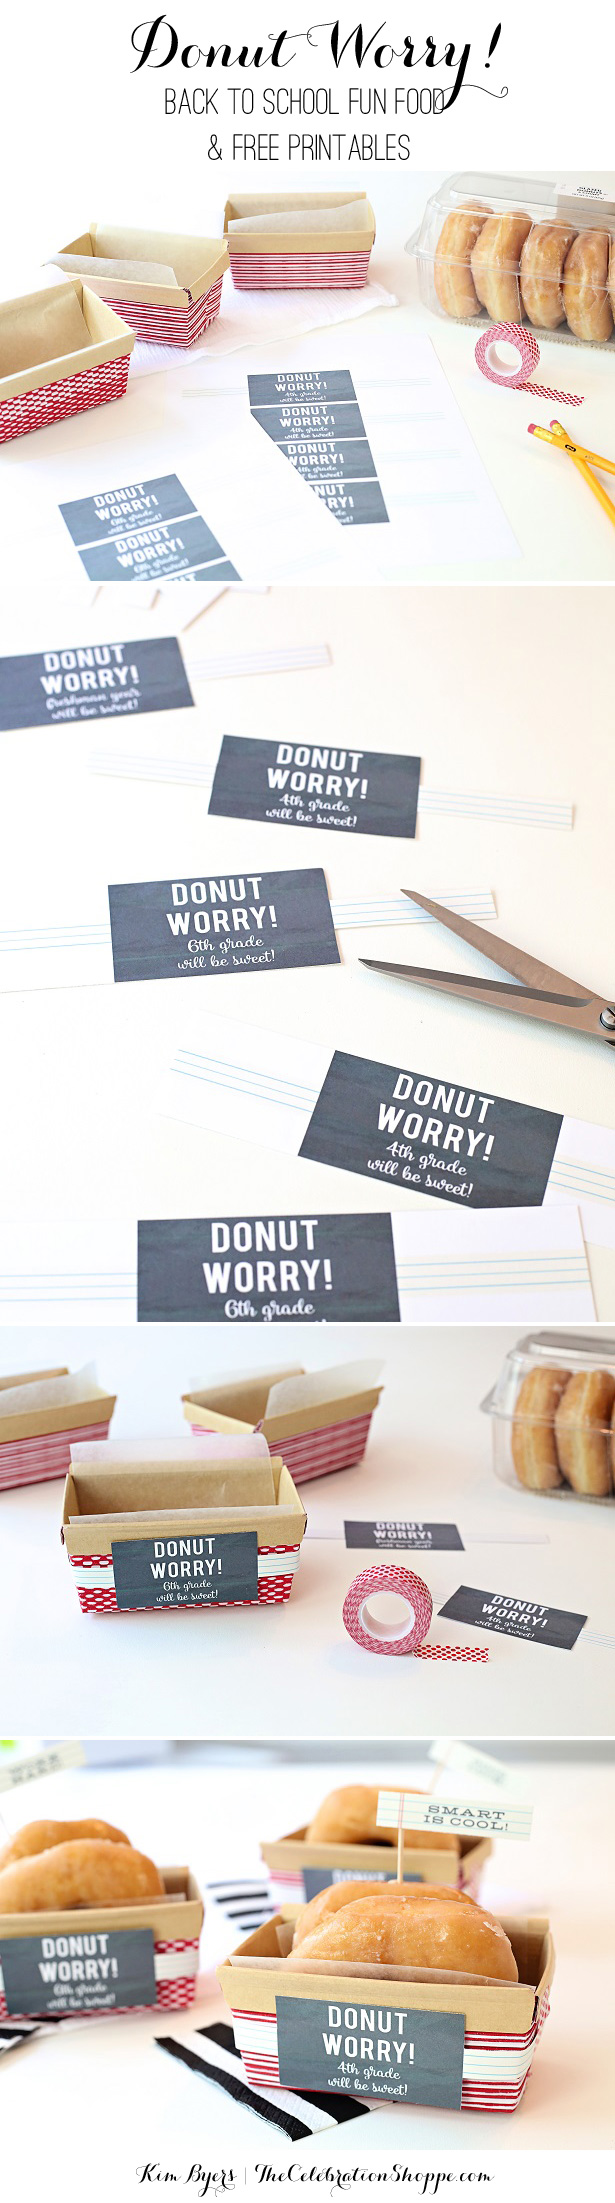 Fun Food and Free Printables | Kim Byers